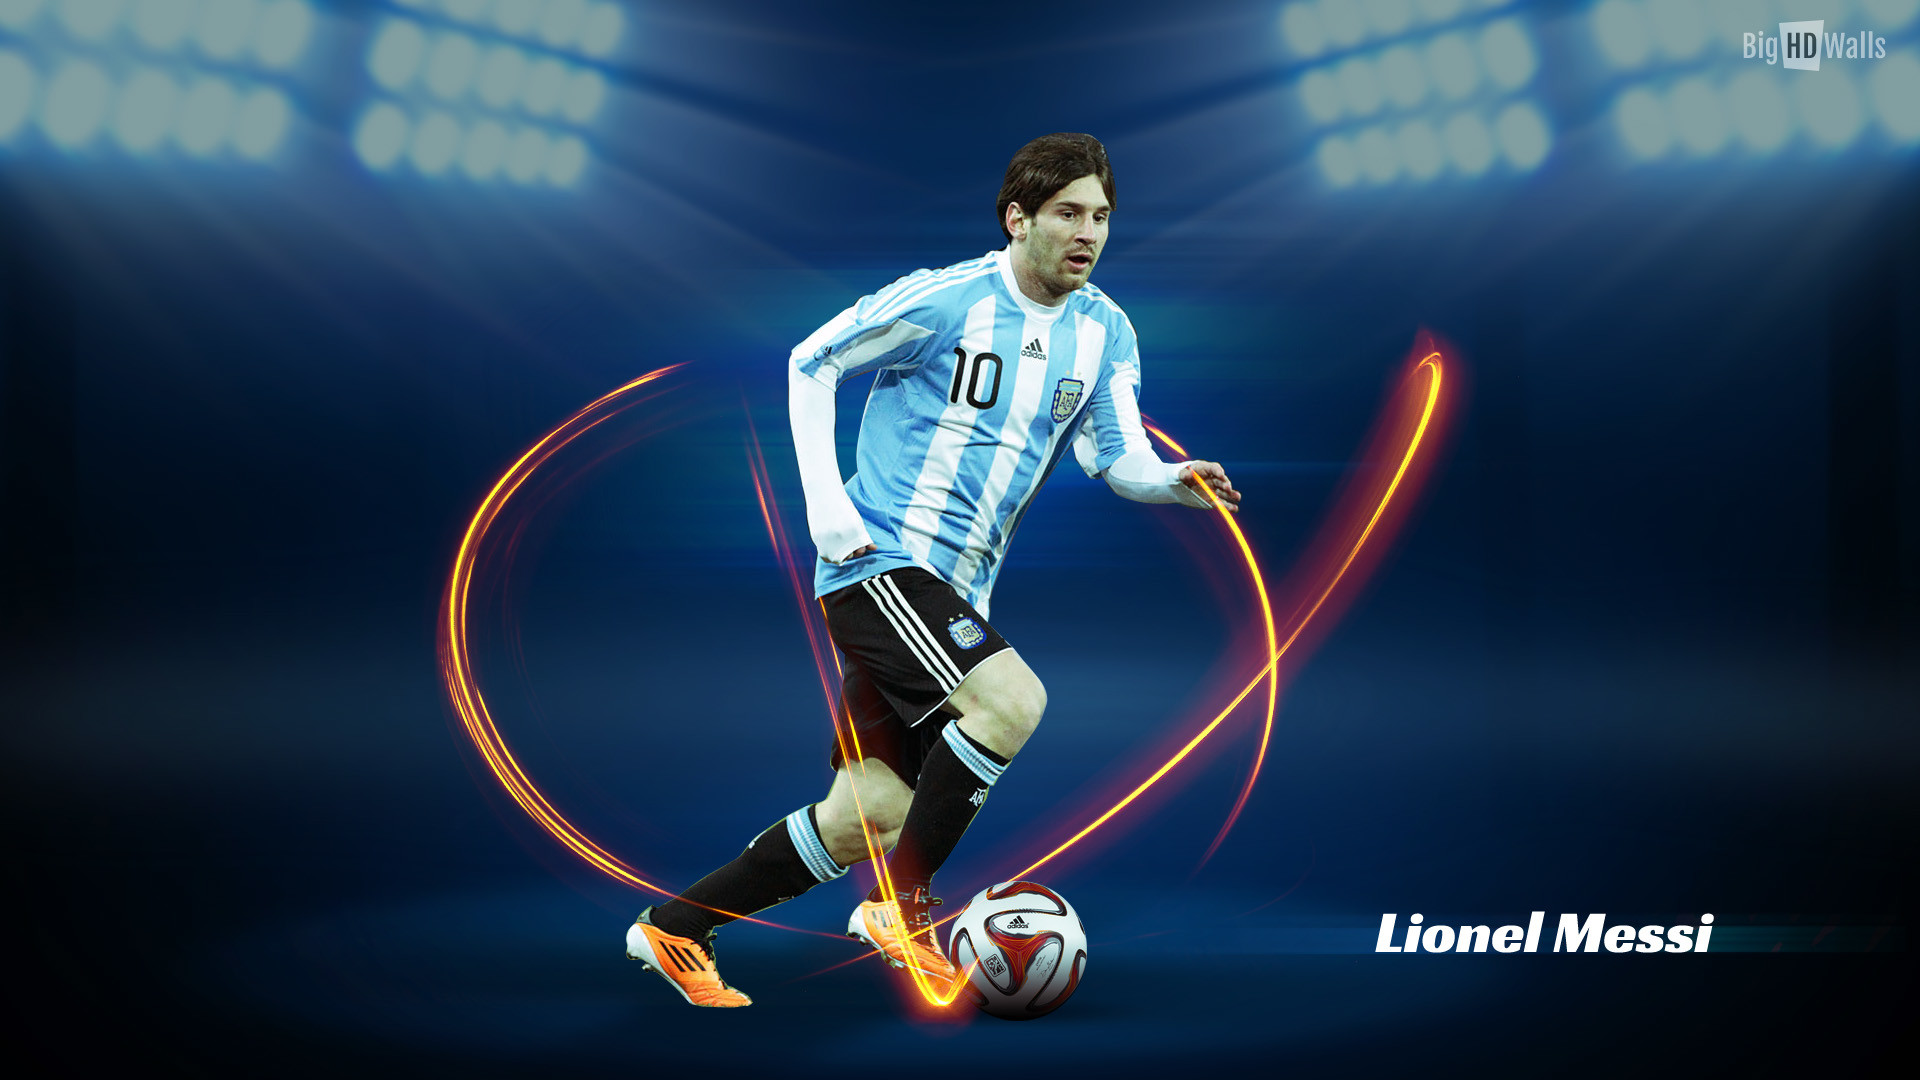 Lionel Messi Argentina FIFA World Cup 2014 wallpapers Messi Argentina HD  2015 Wallpaper